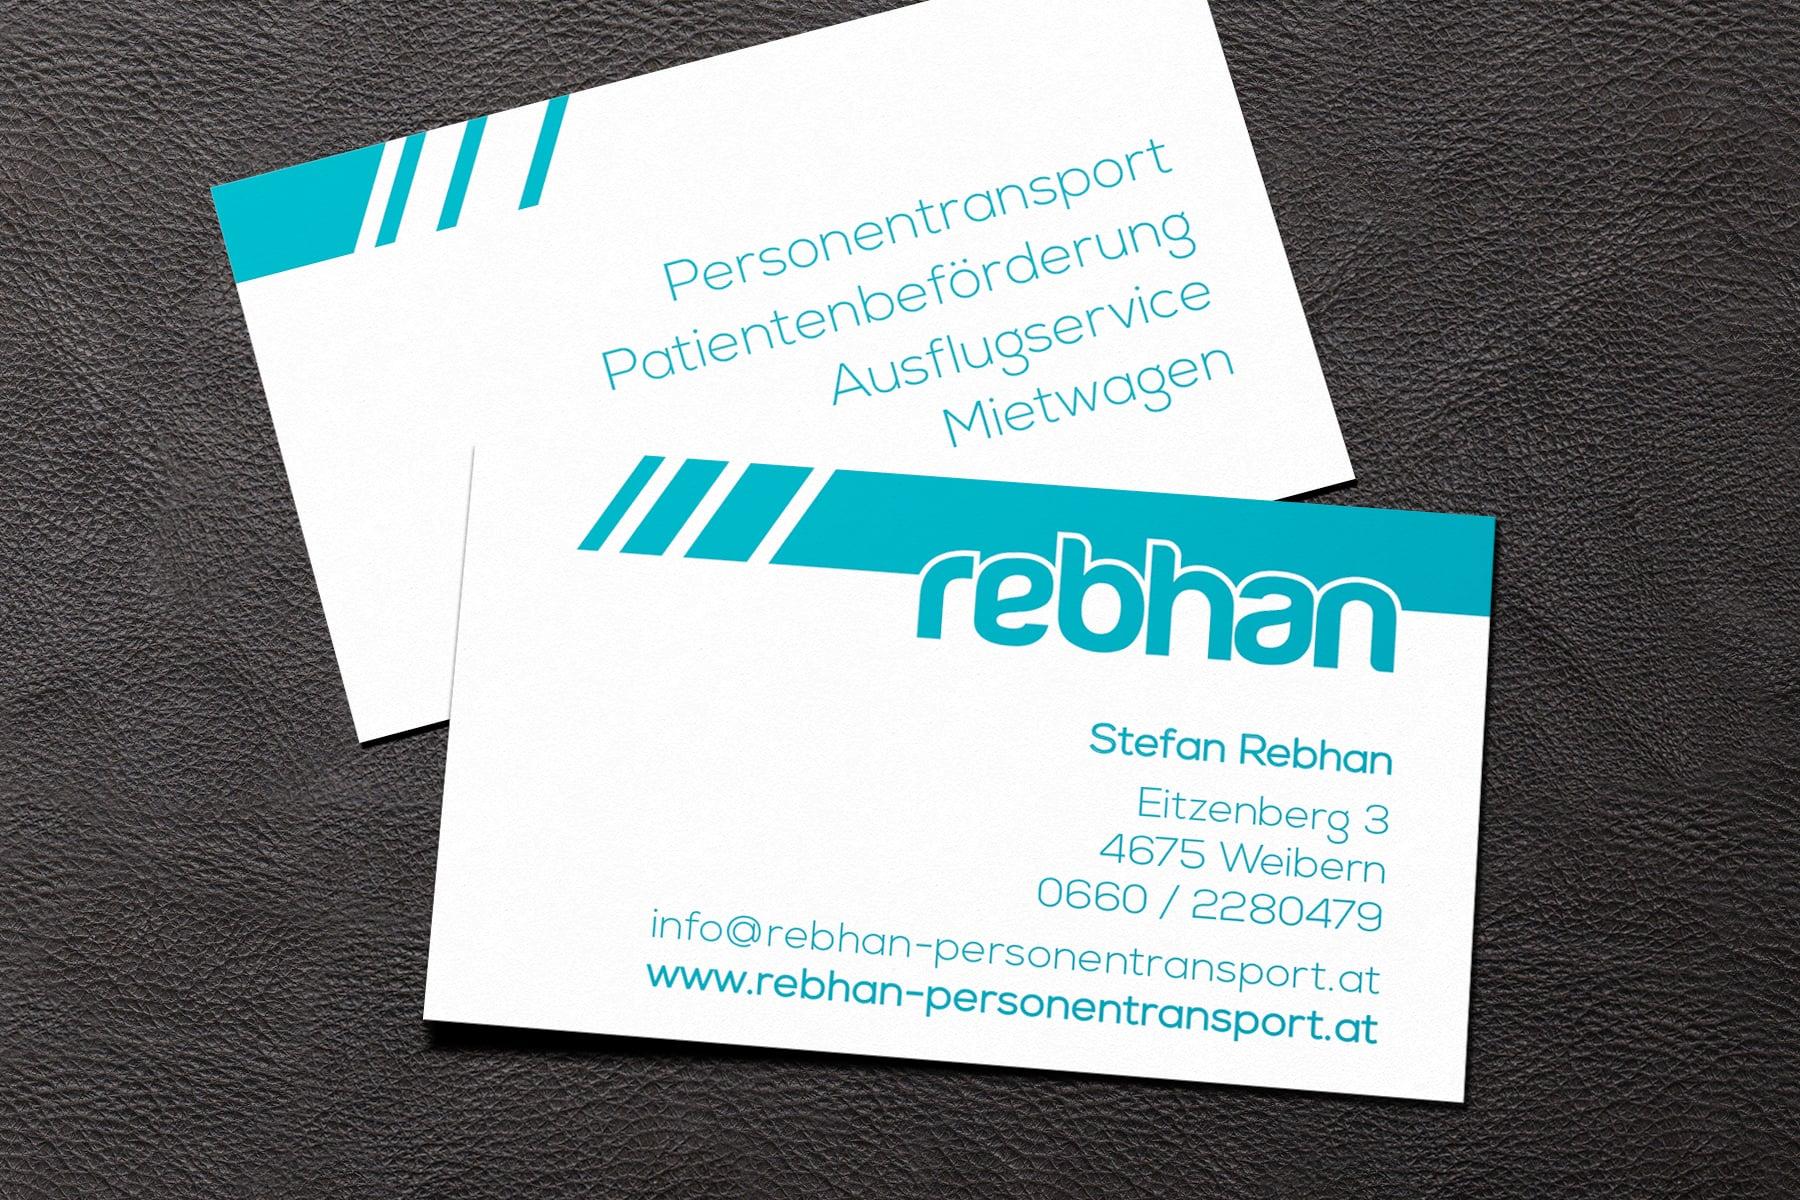 Corporate Design und Fahrzeugbeschriftung Rebhan Personentransport